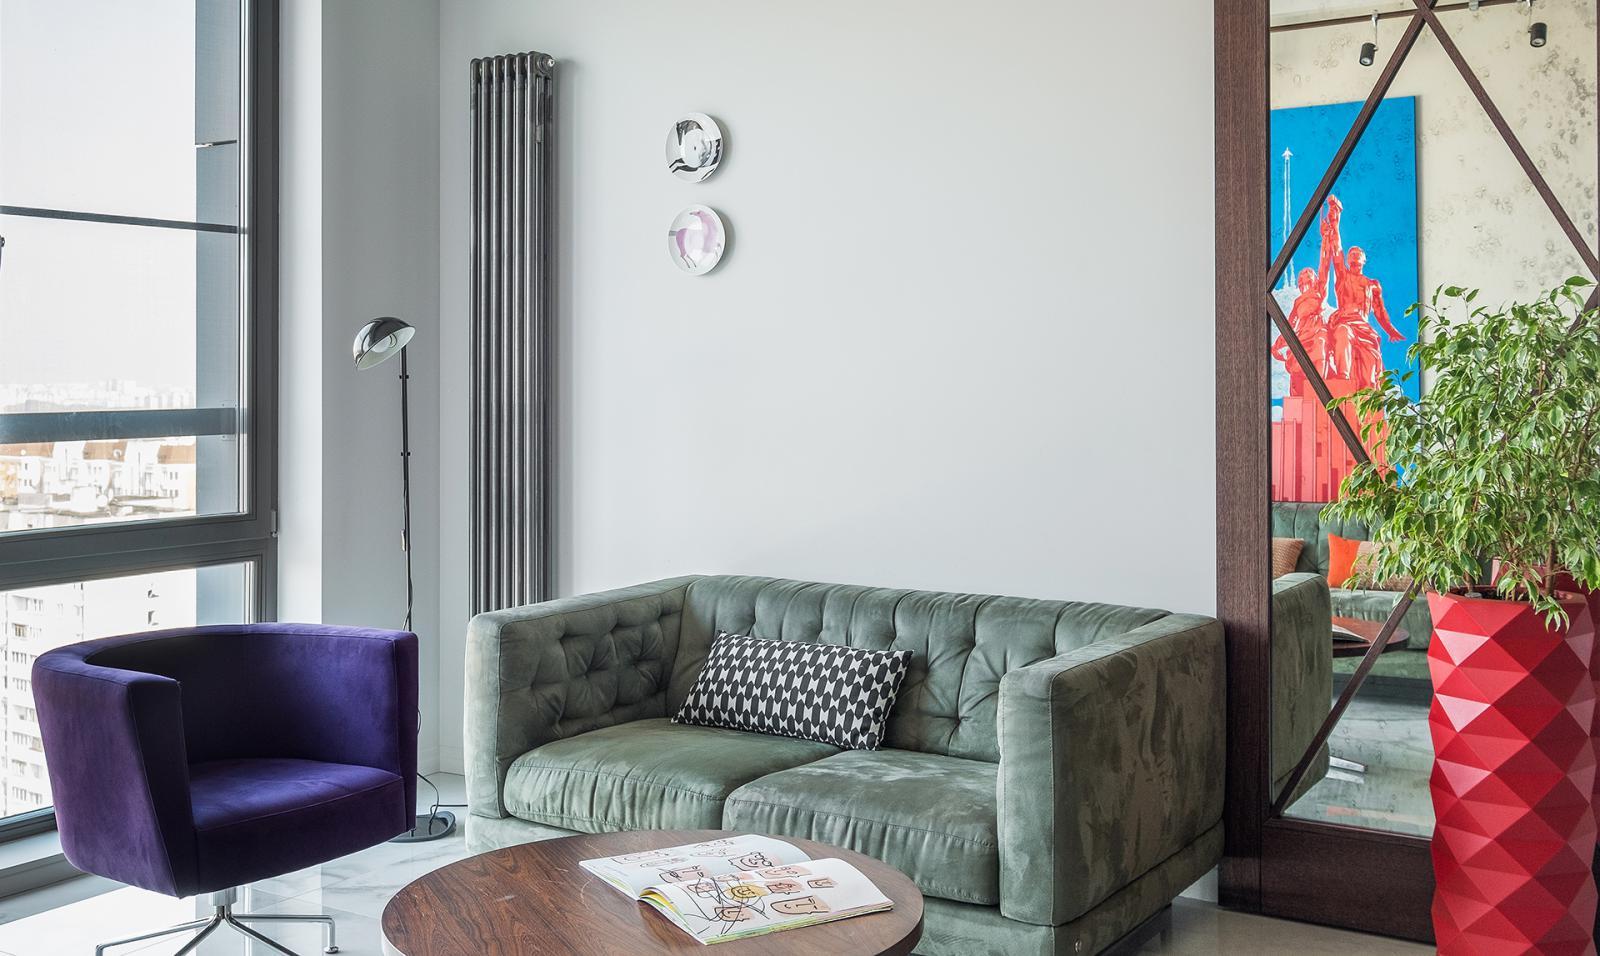 Dvekati: cовременная квартира с элементами ар-деко